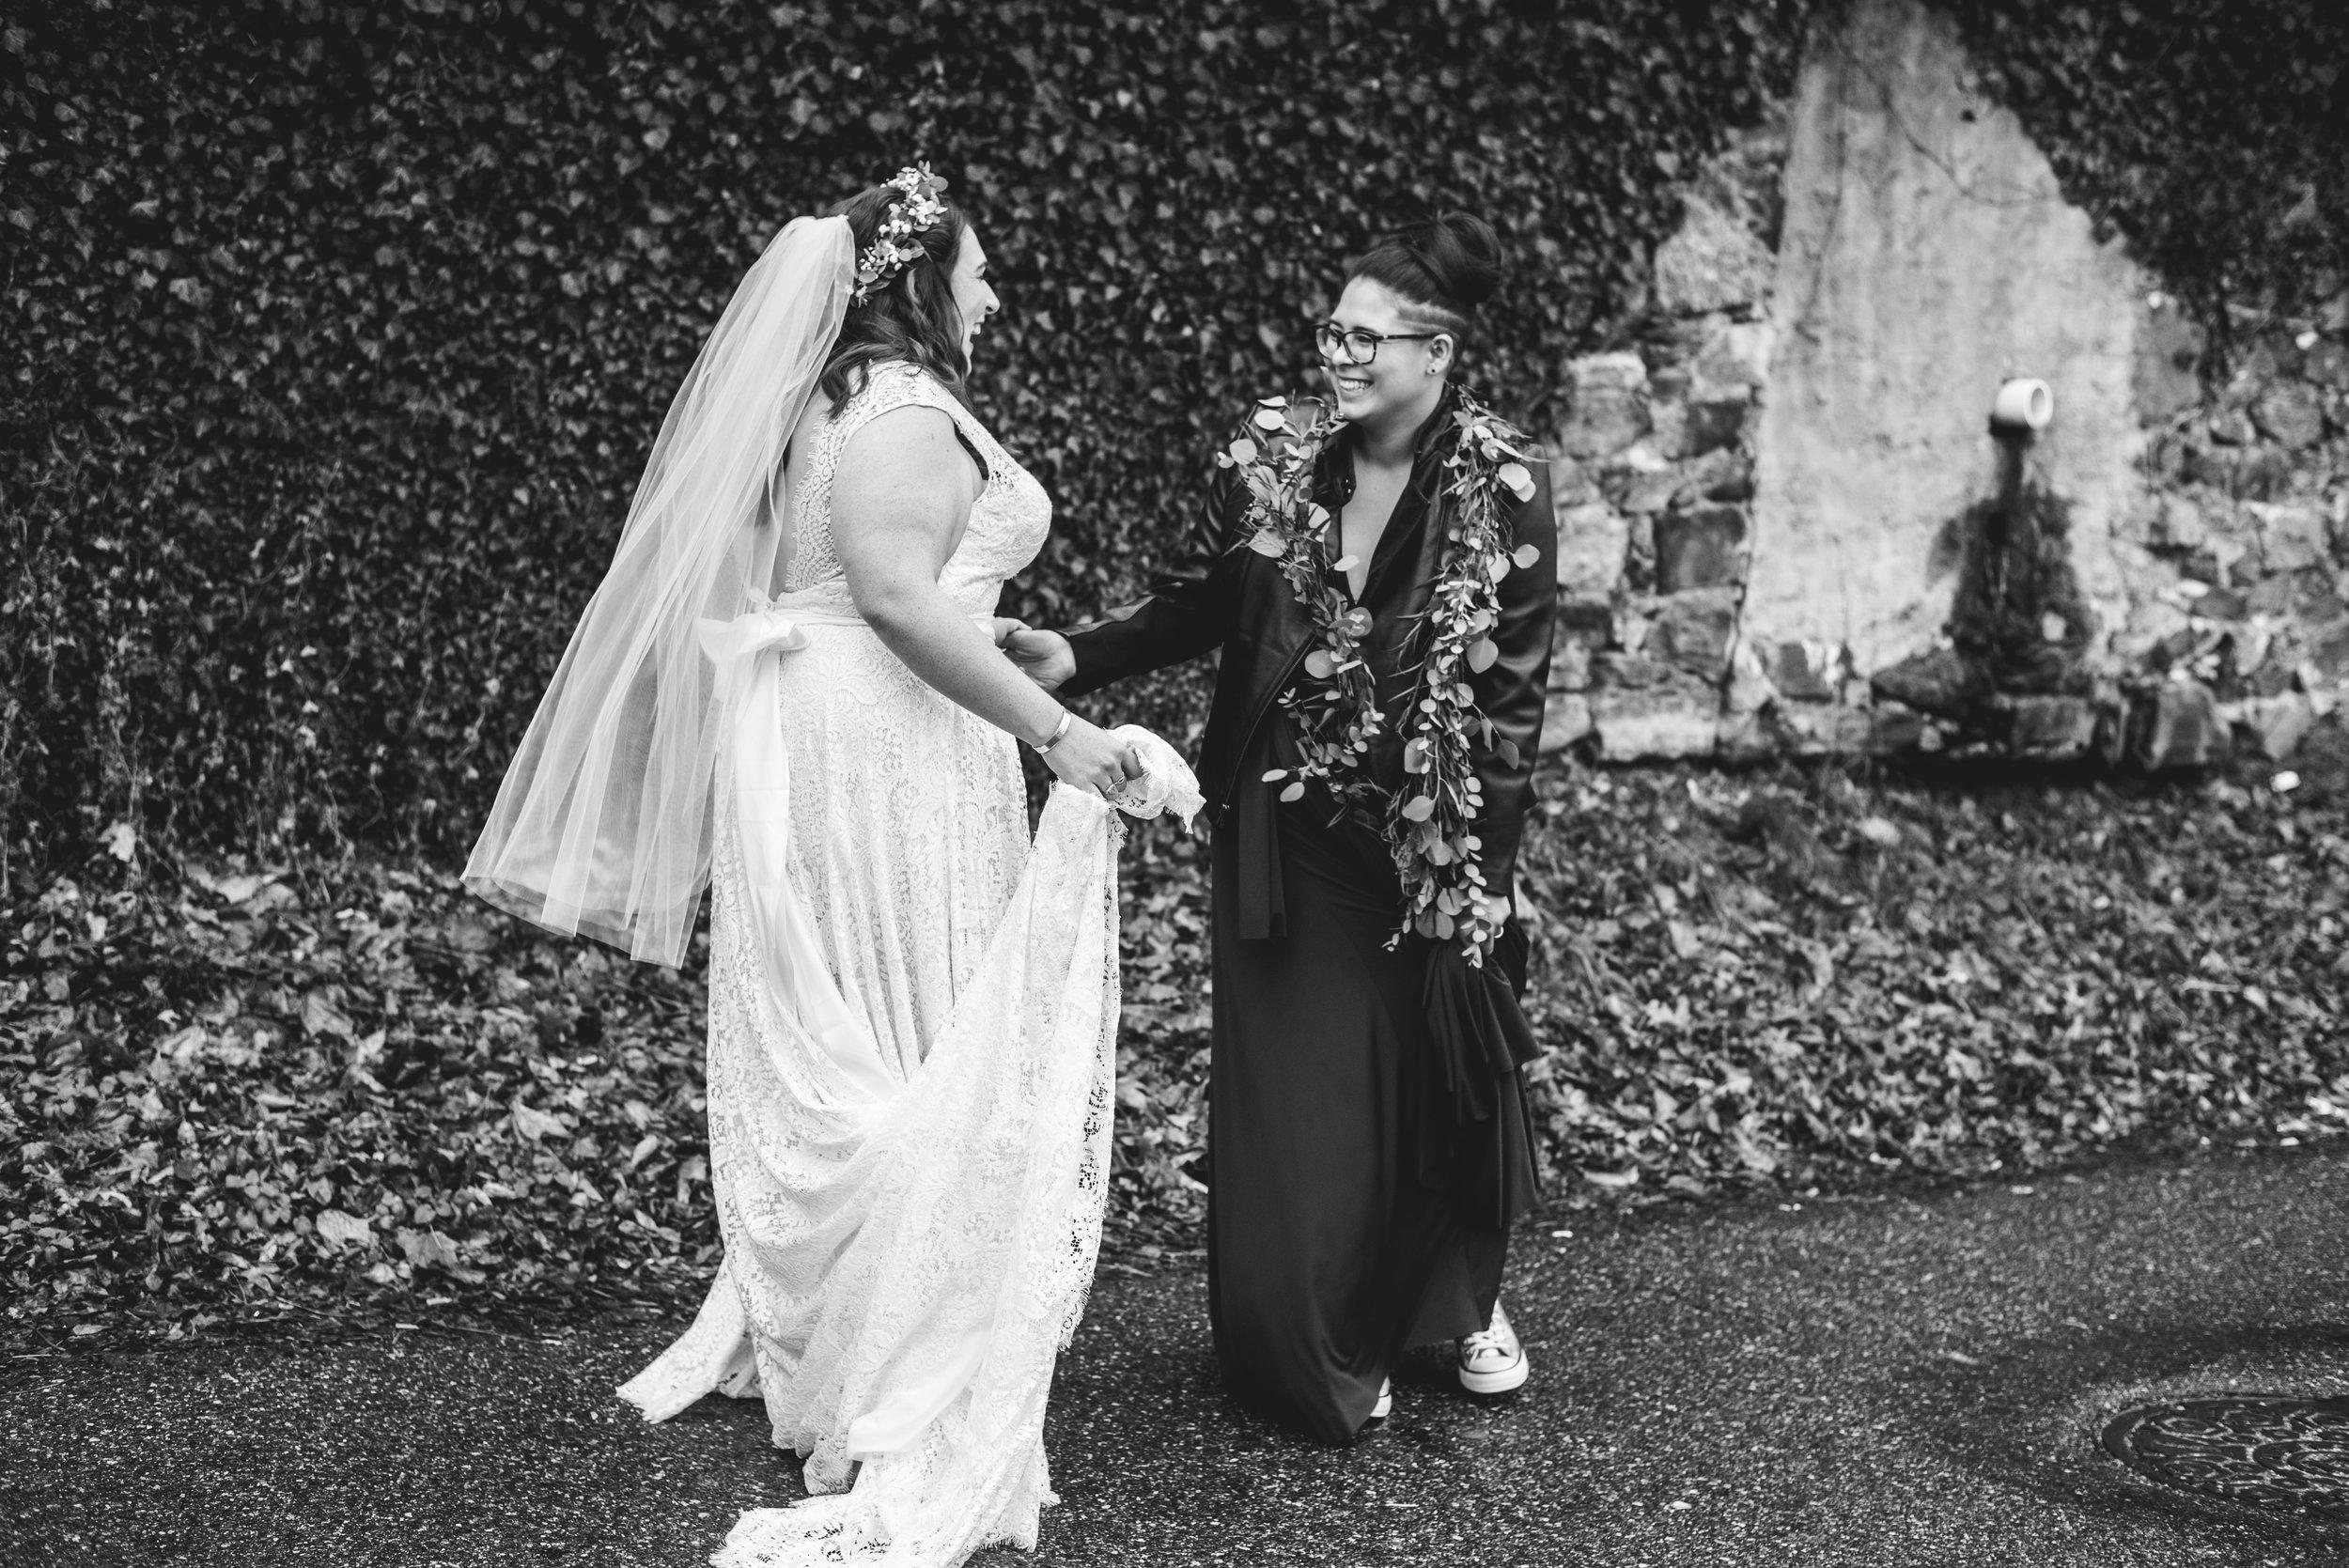 LGBTQ Philadelphia Wedding by Swiger Photography the Lesbian photographer 16